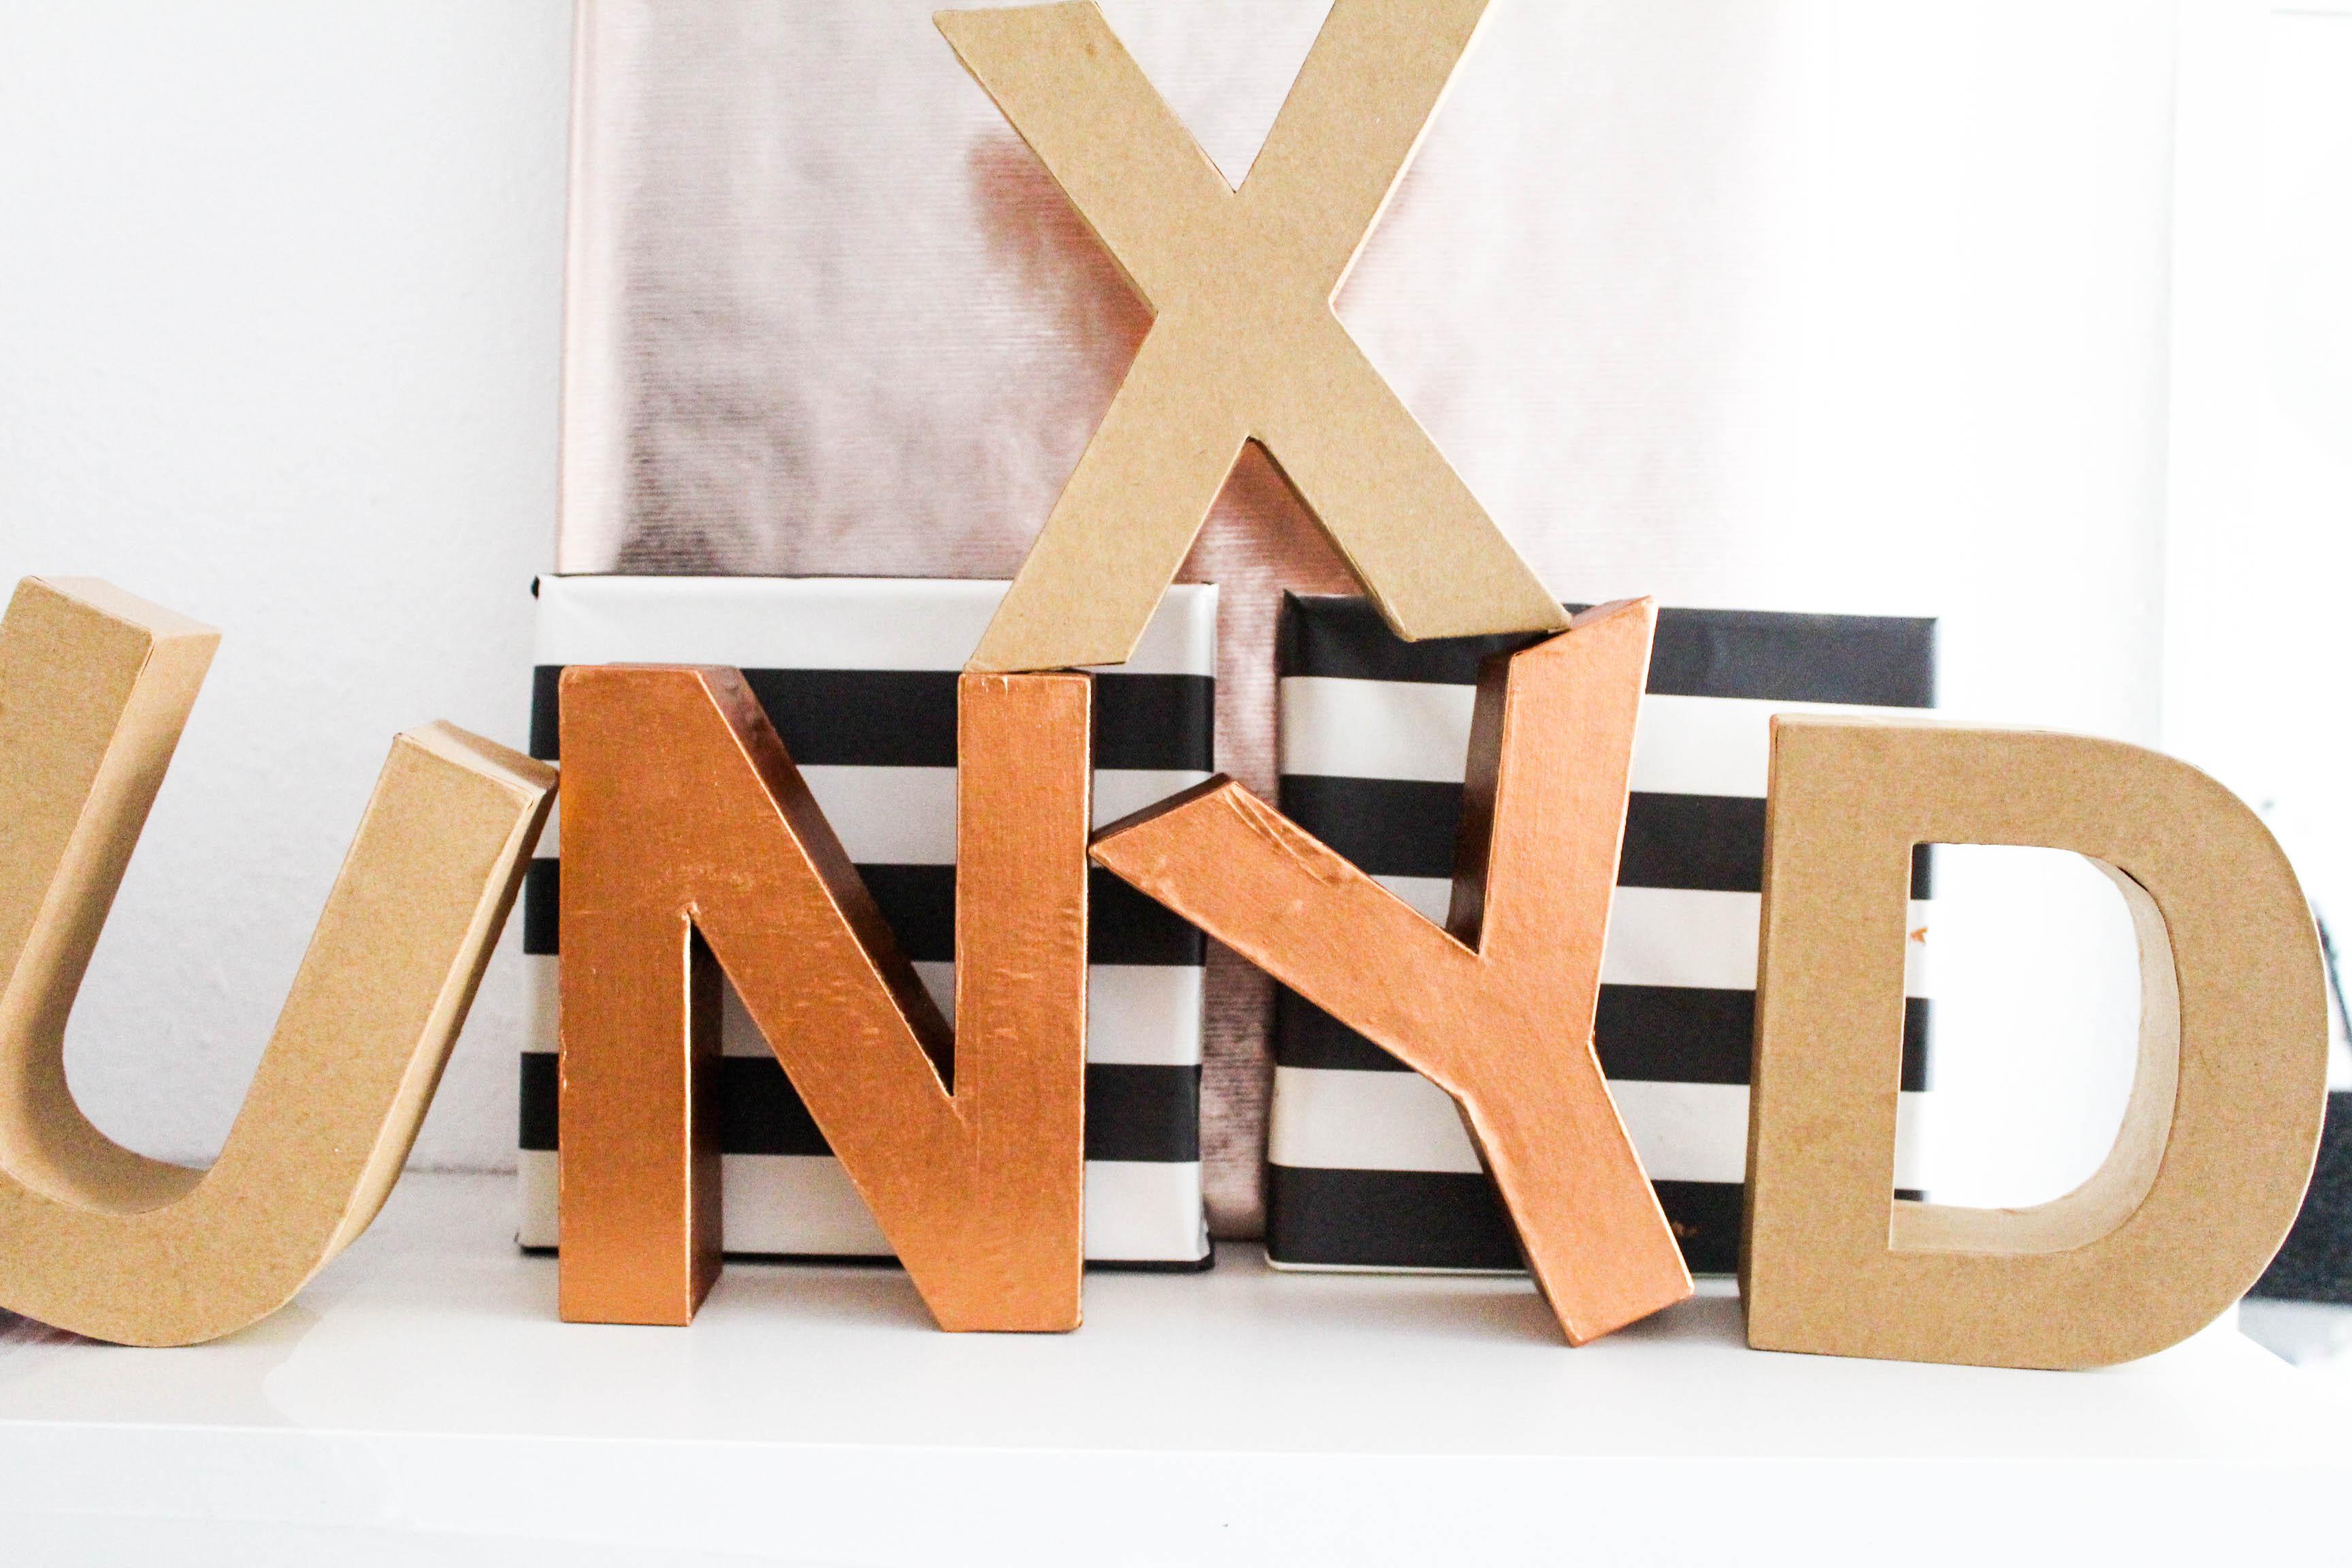 diy kupfer buchstaben sch nwild. Black Bedroom Furniture Sets. Home Design Ideas